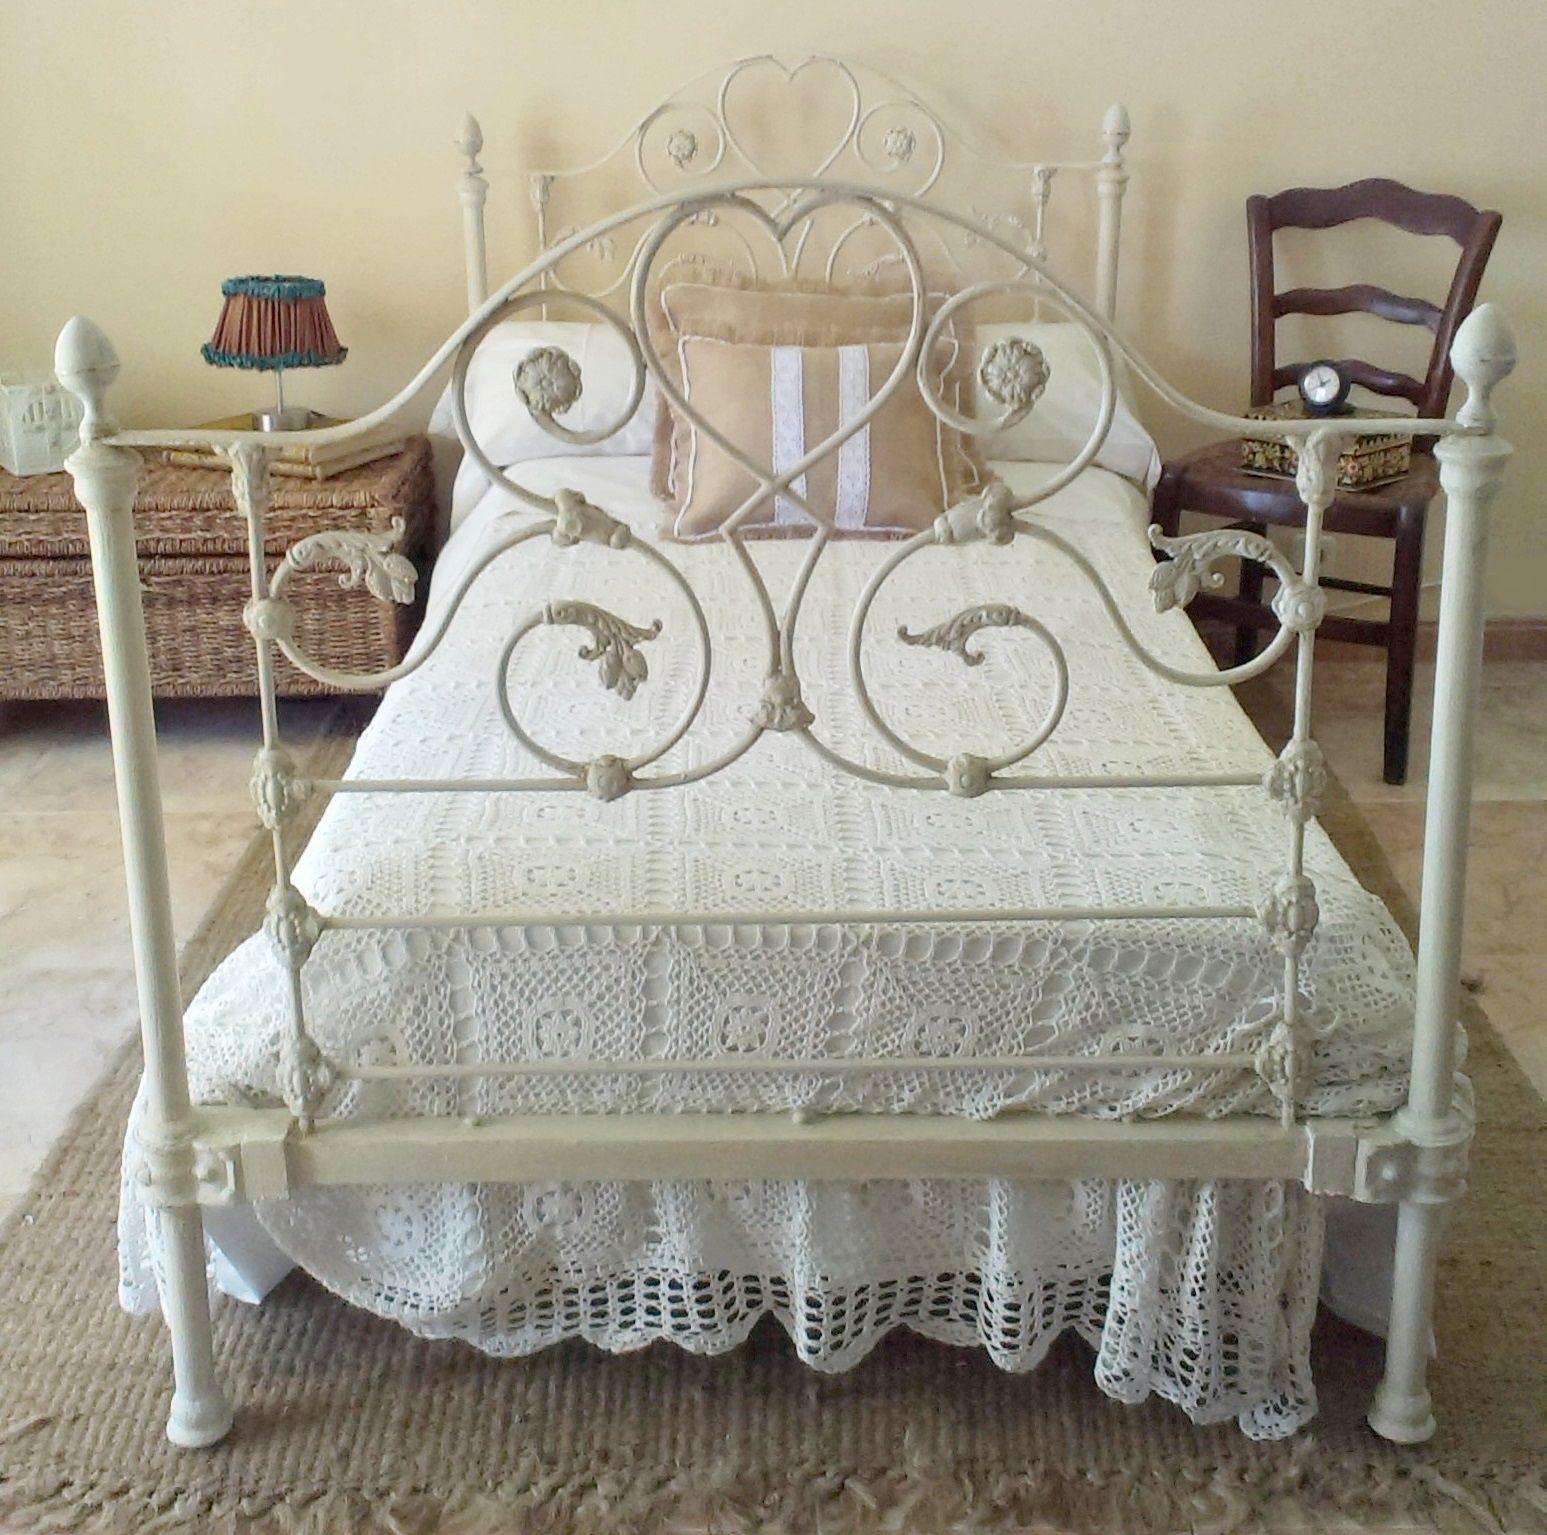 Antigua cama de forja estilo shabby shabby old iron bed for Camas estilo vintage